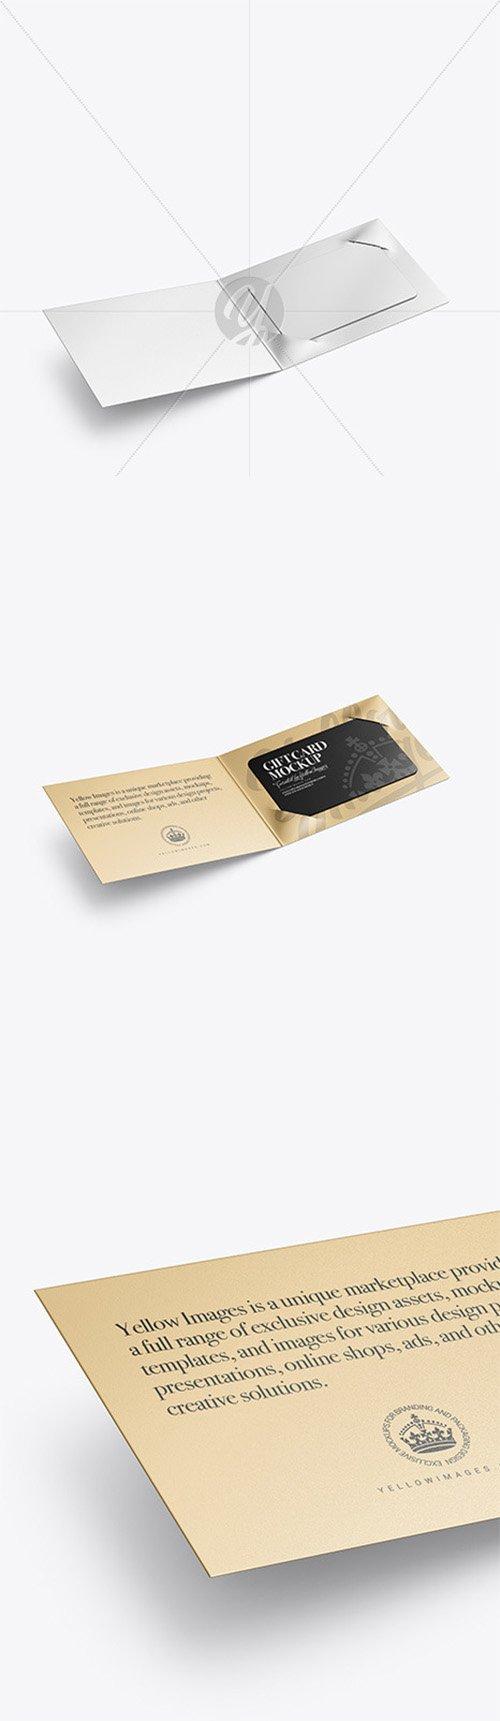 Metallic Gift Card Mockup 64433 TIF